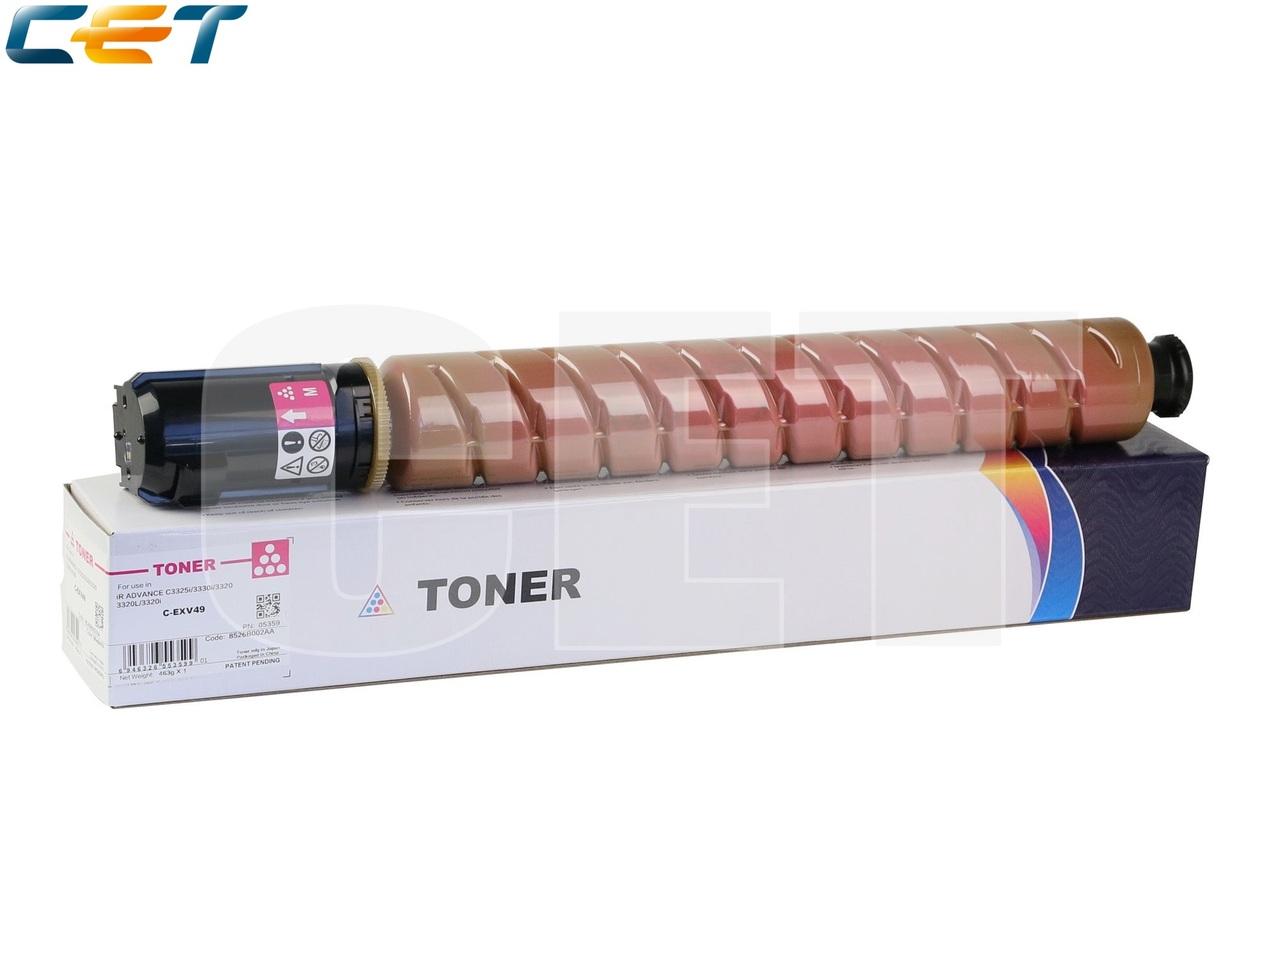 Тонер-картридж (CPP, TF8) C-EXV49 для CANON iR ADVANCEC3325i/3330i/3320 (CET) Magenta, 463г, 19000 стр., CET5359